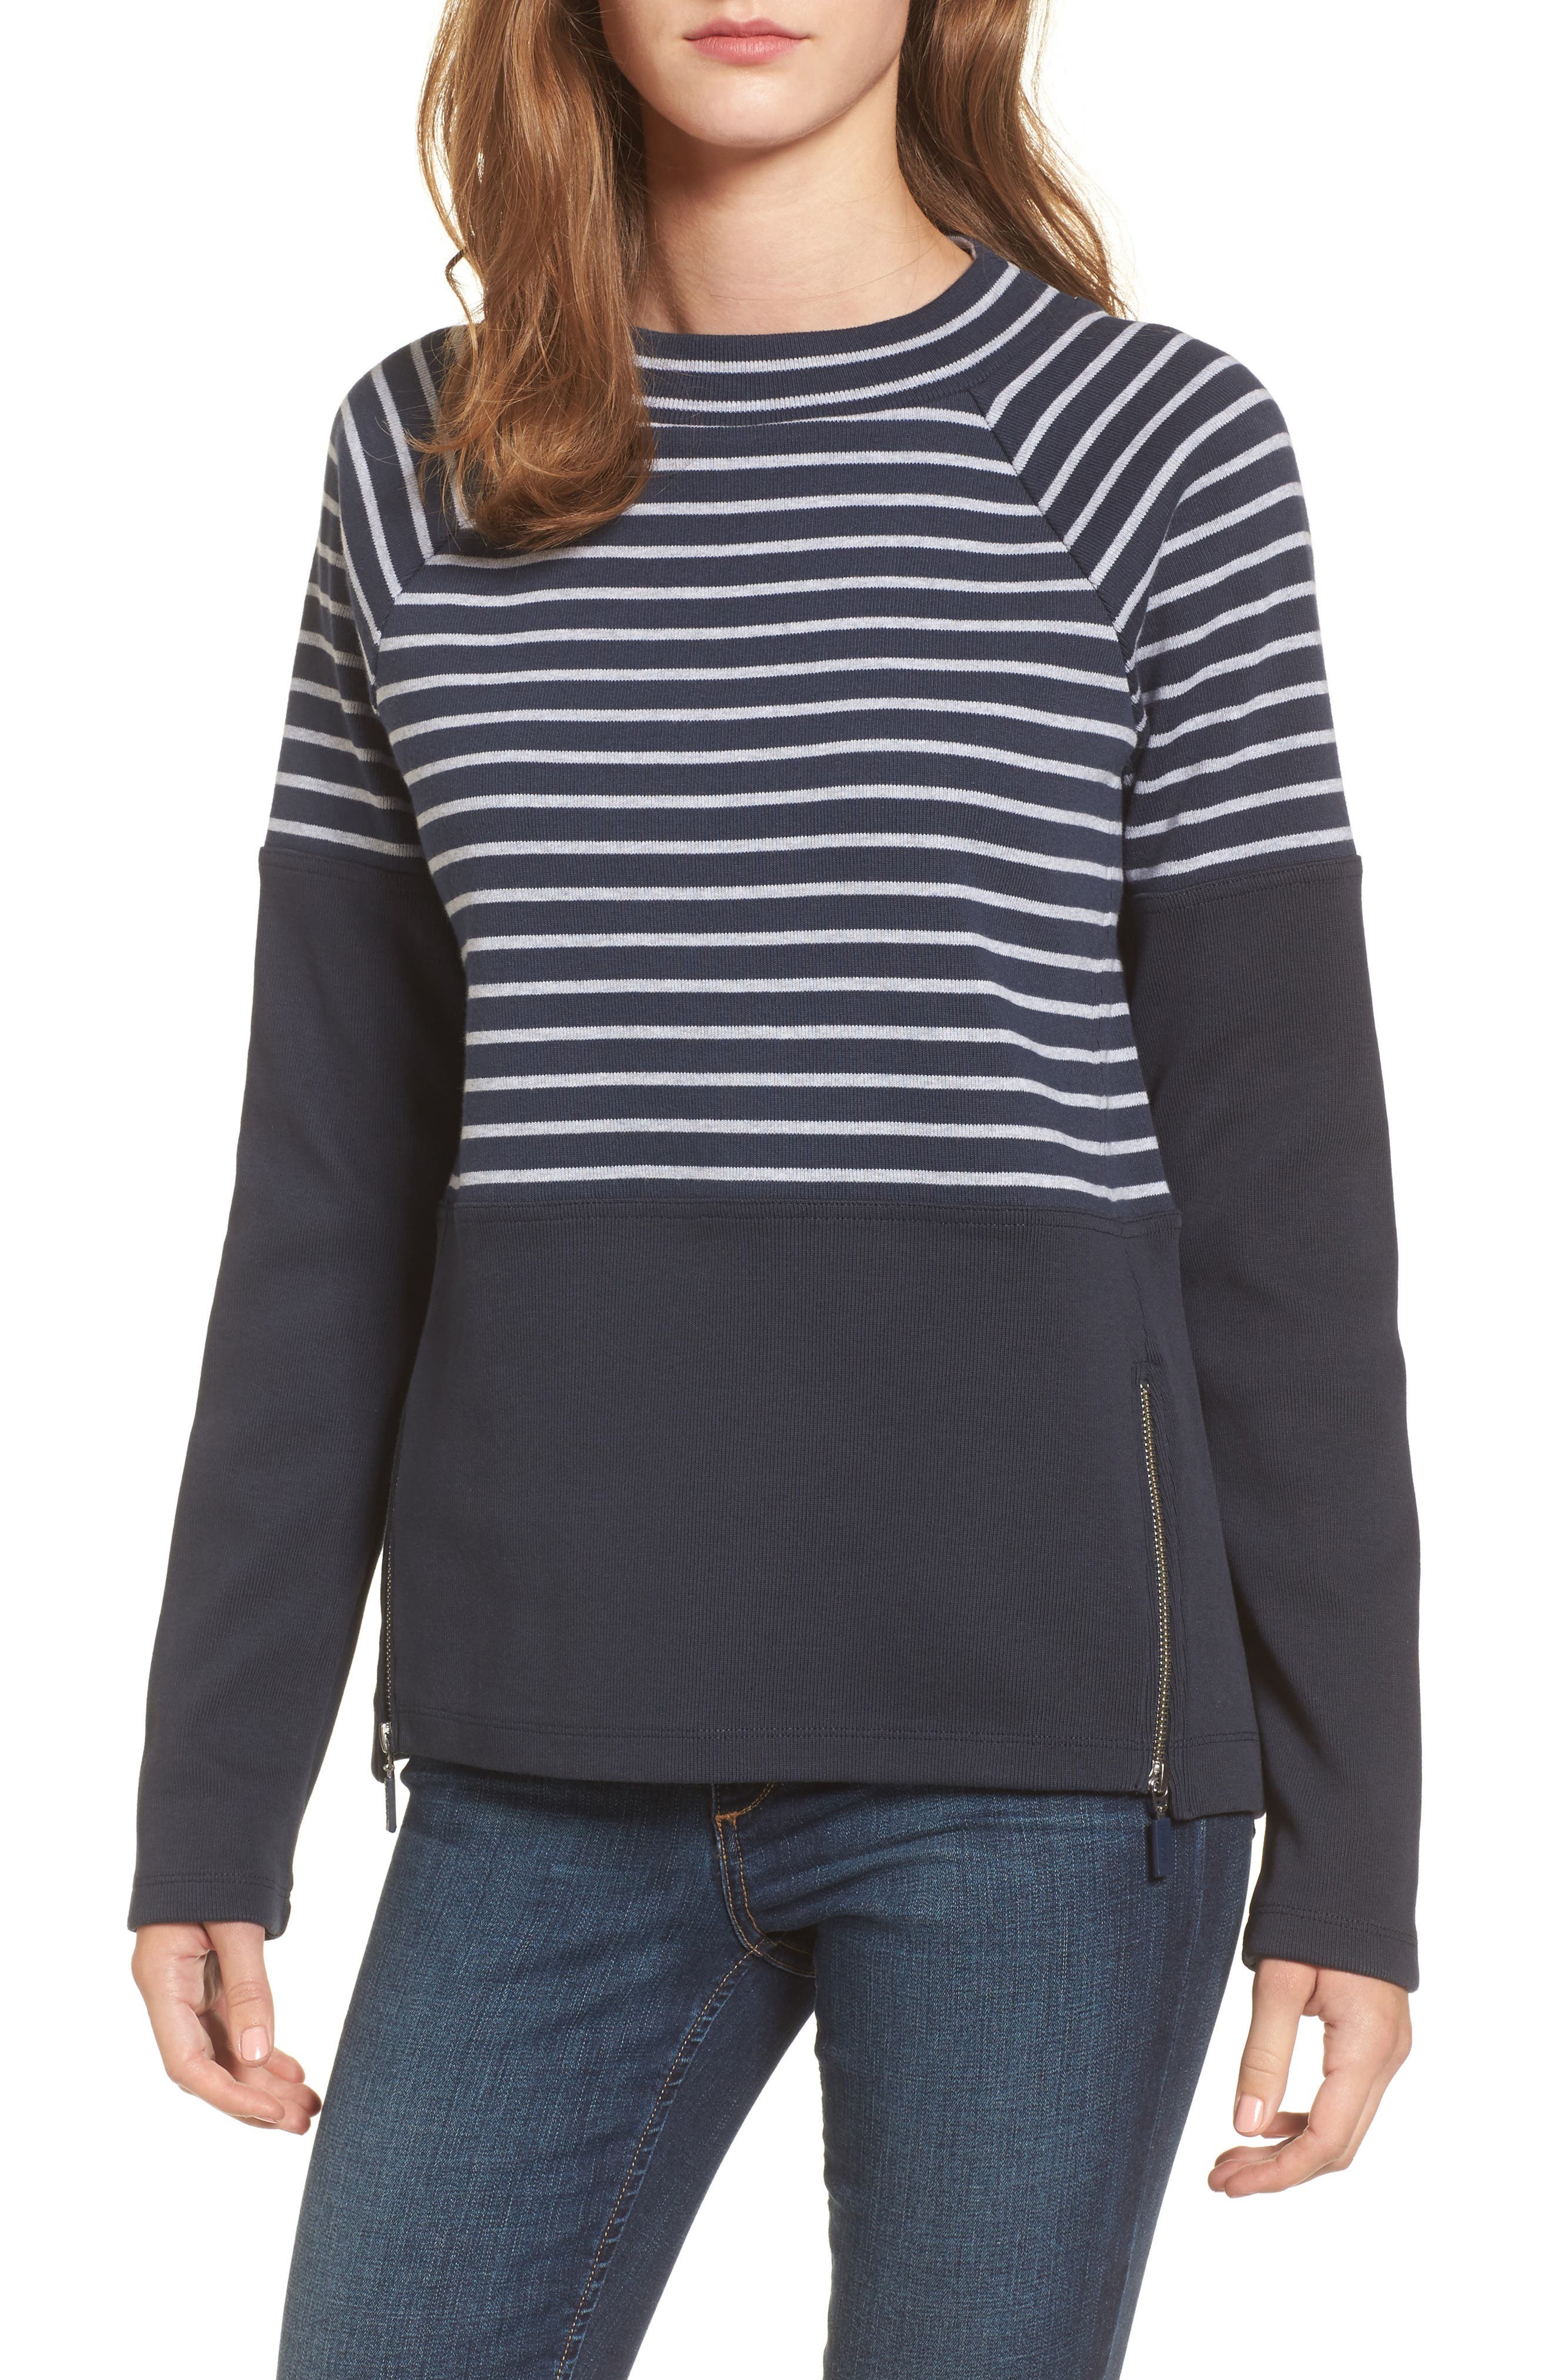 Main Image - Barbour Seaburn Stripe Sweatshirt